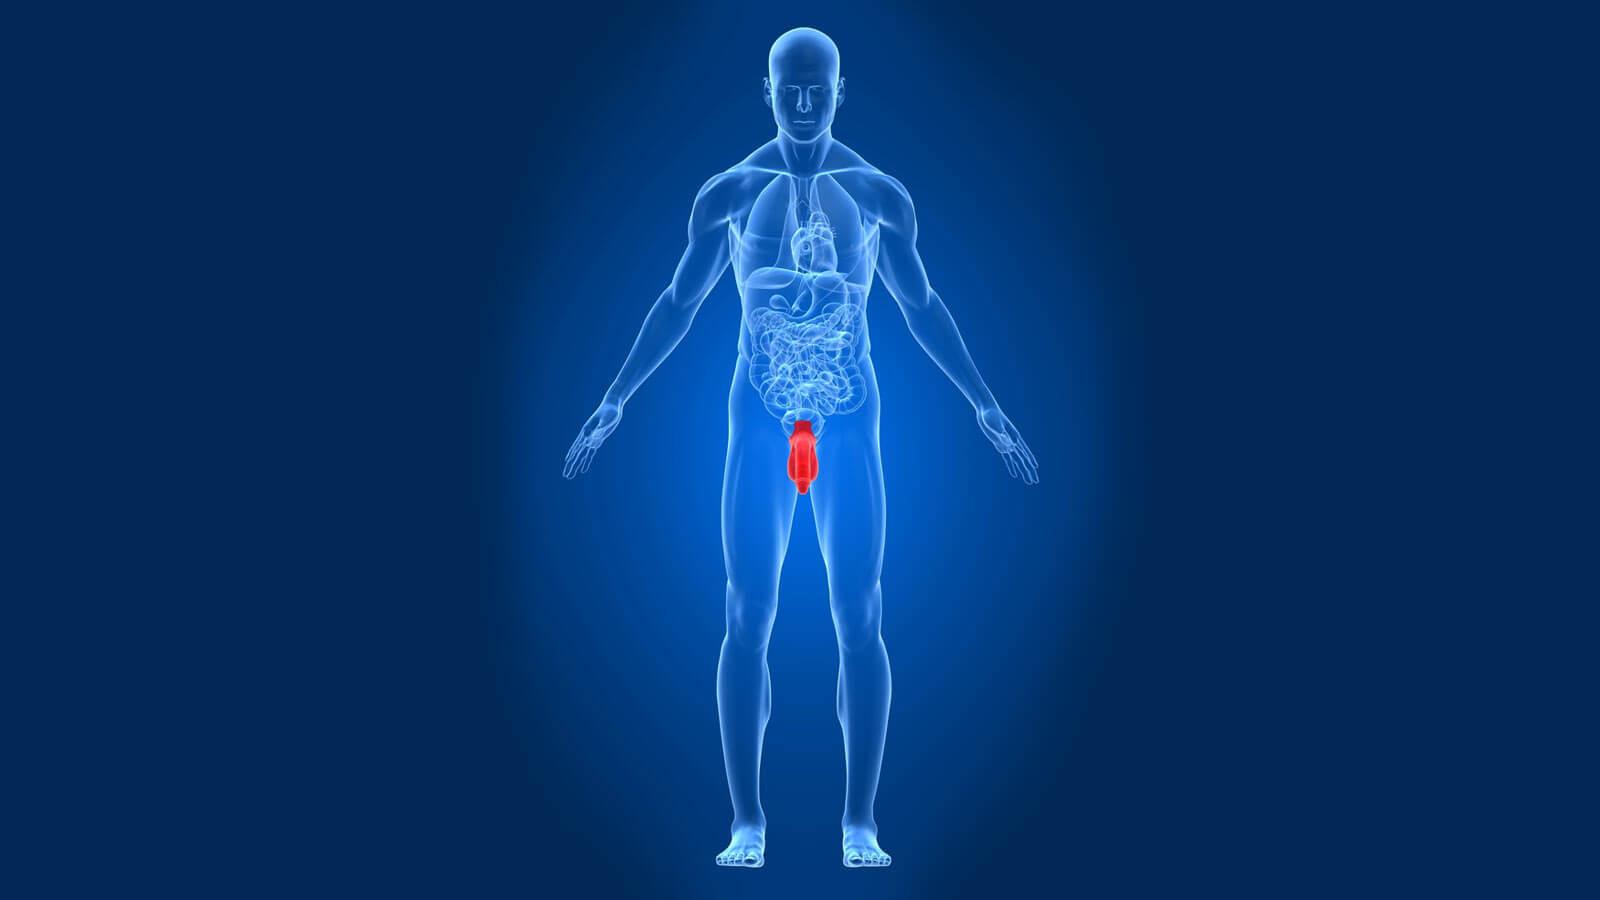 Anatomie geschlechtsverkehr Category:Penile